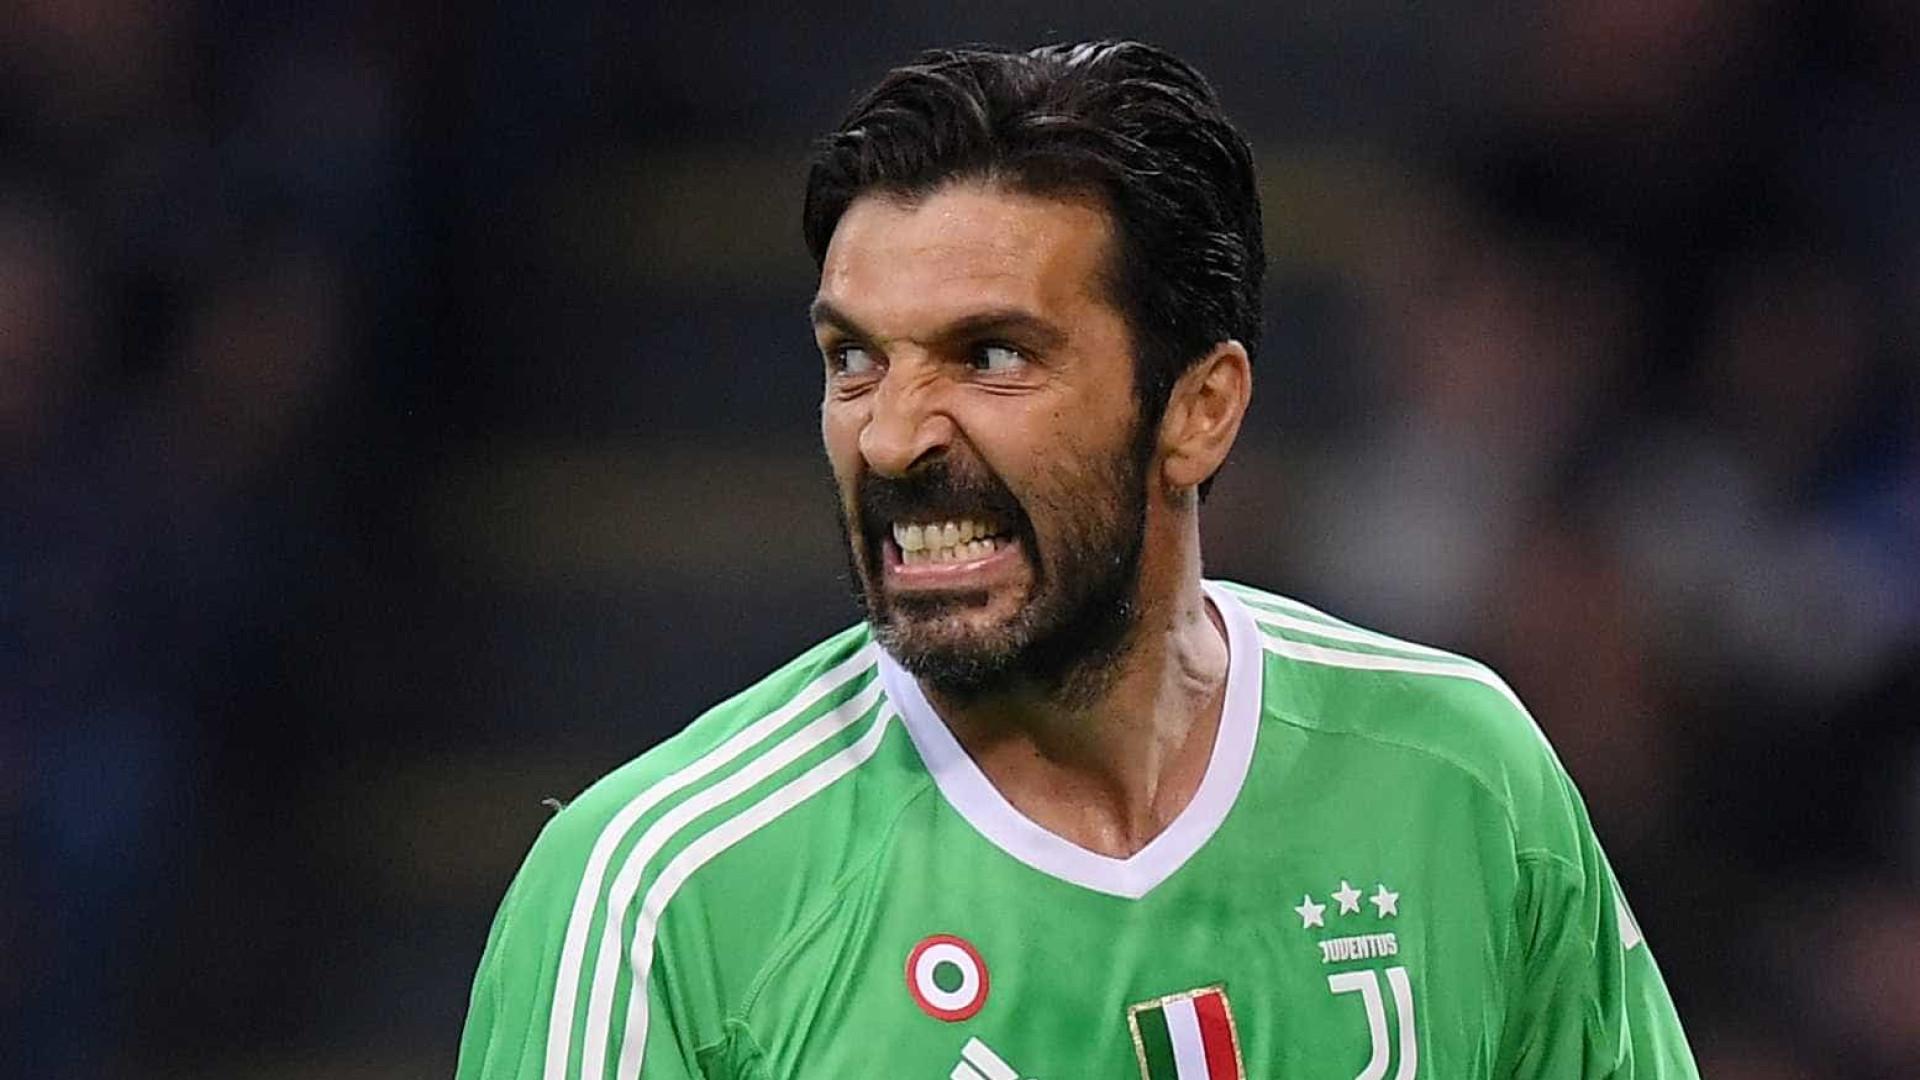 Buffon deixará a Juventus no fim da temporada